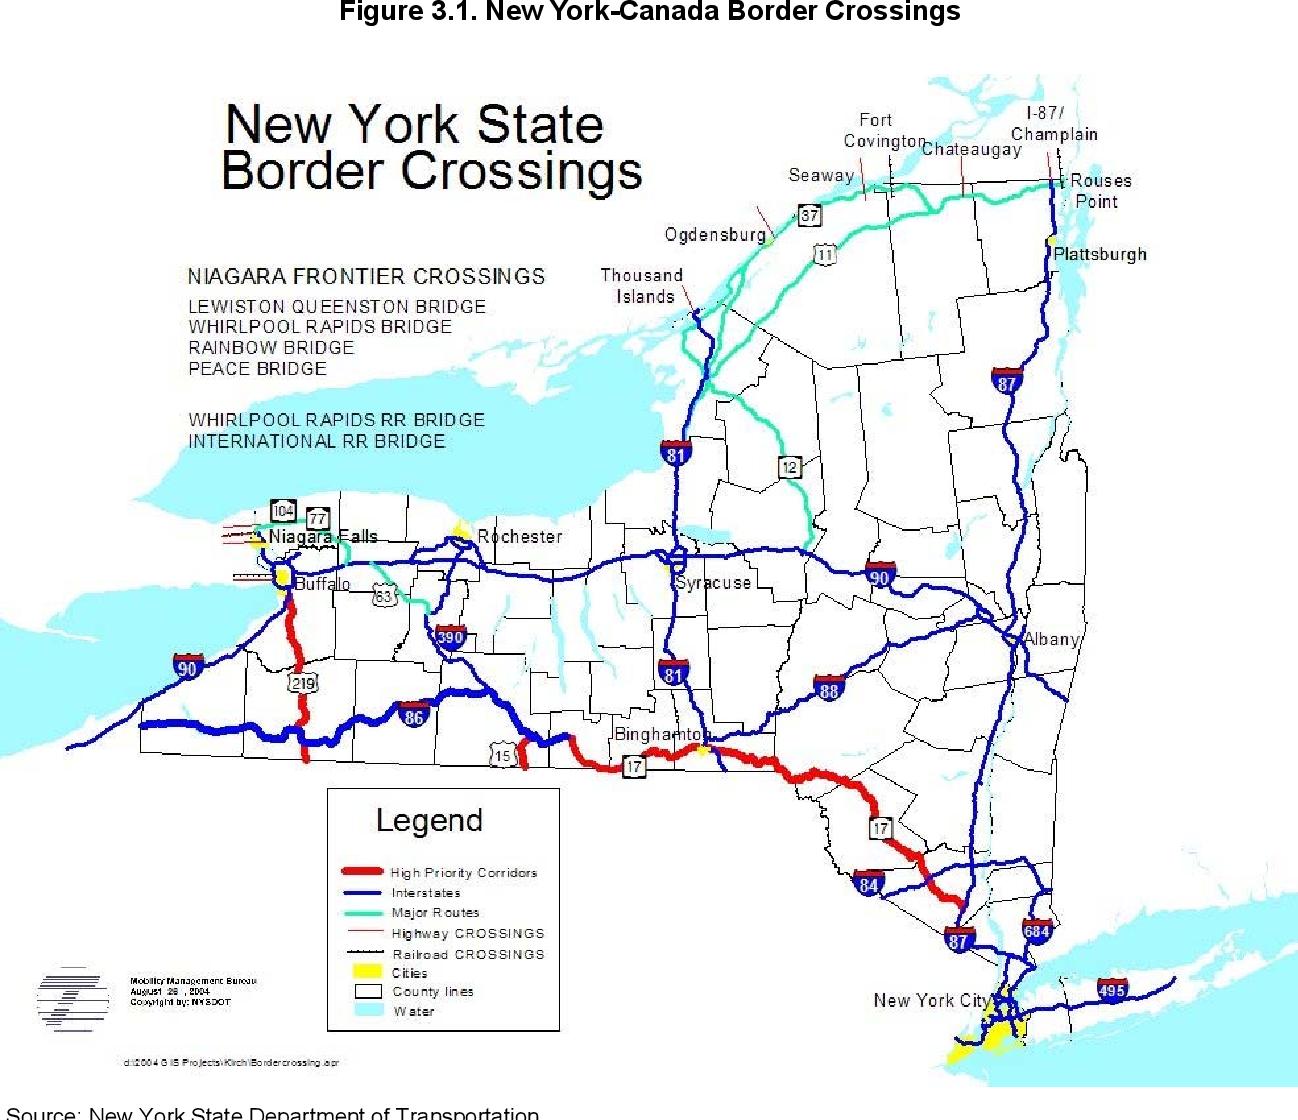 Map Of Canada New York Border.Figure 3 1 From Assessing New York S Border Needs Semantic Scholar